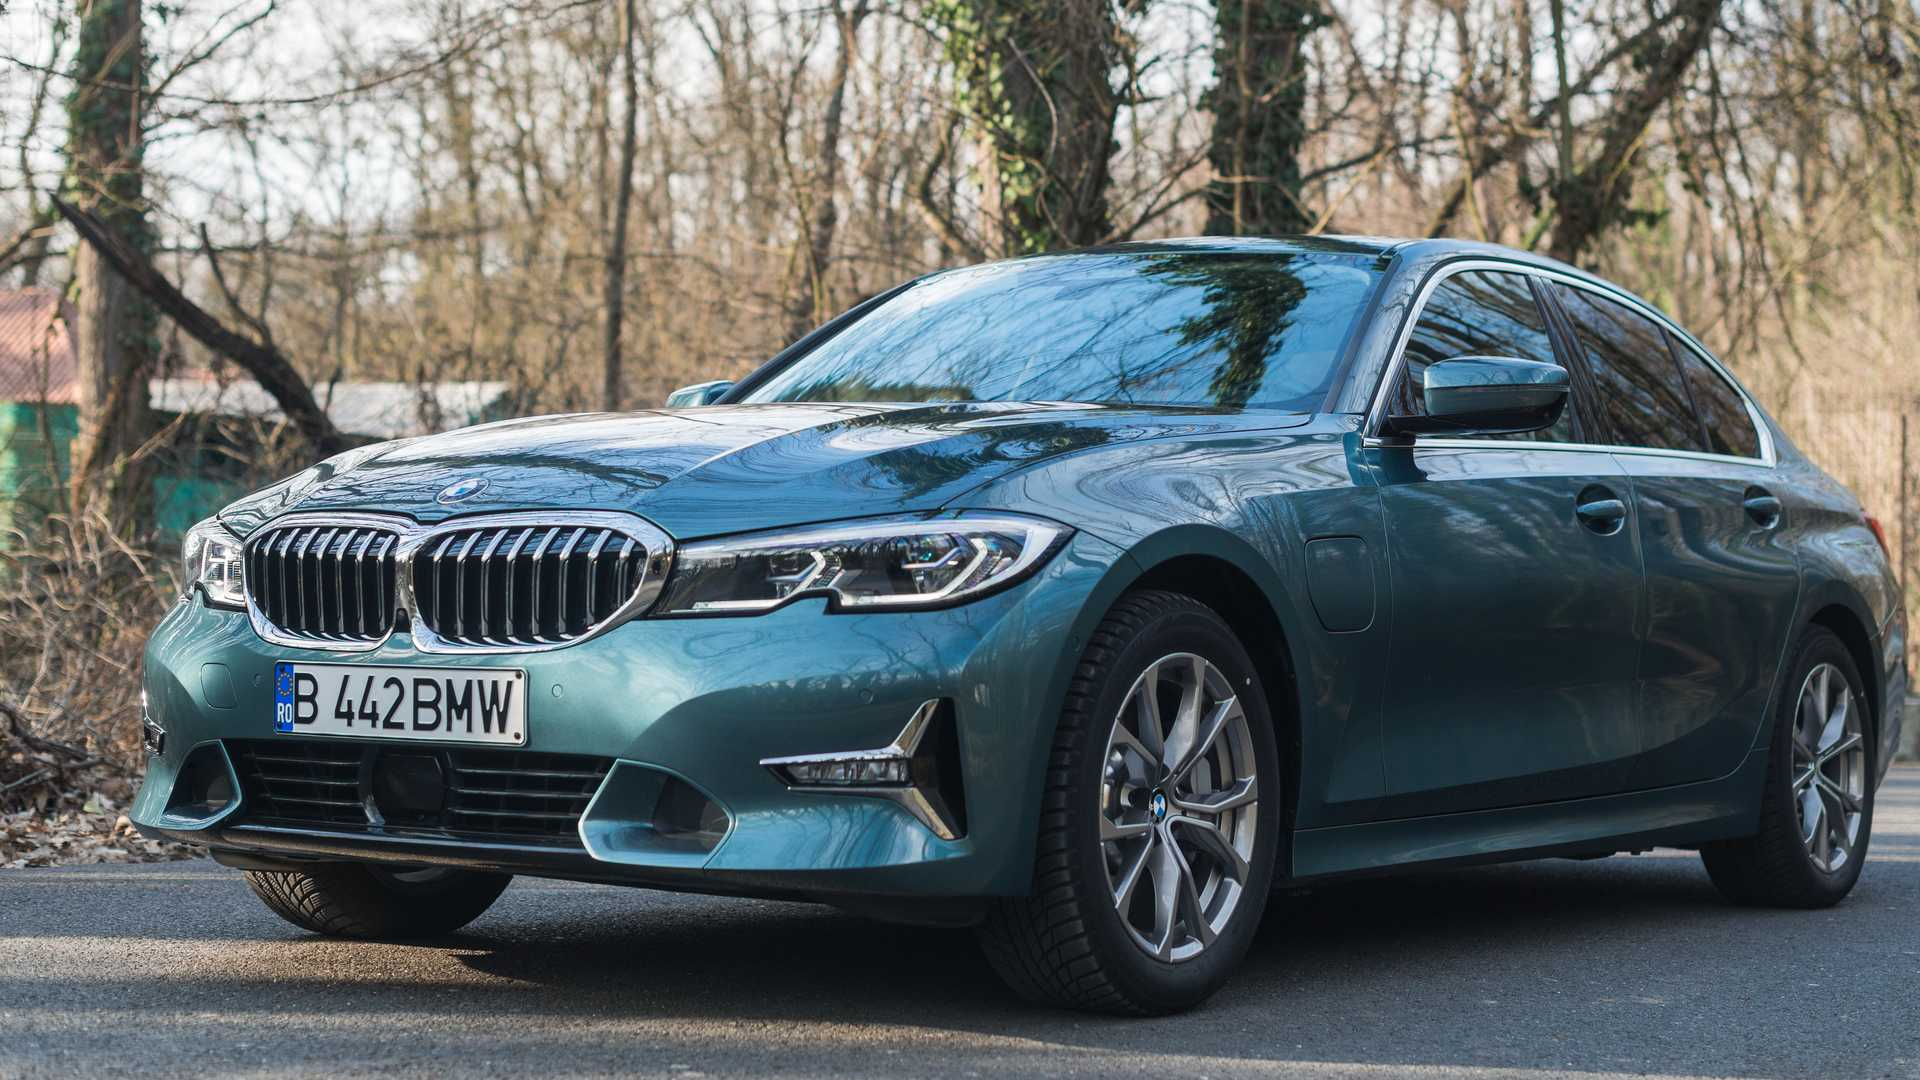 2020 BMW 3 Series Edrive Phev Rumors